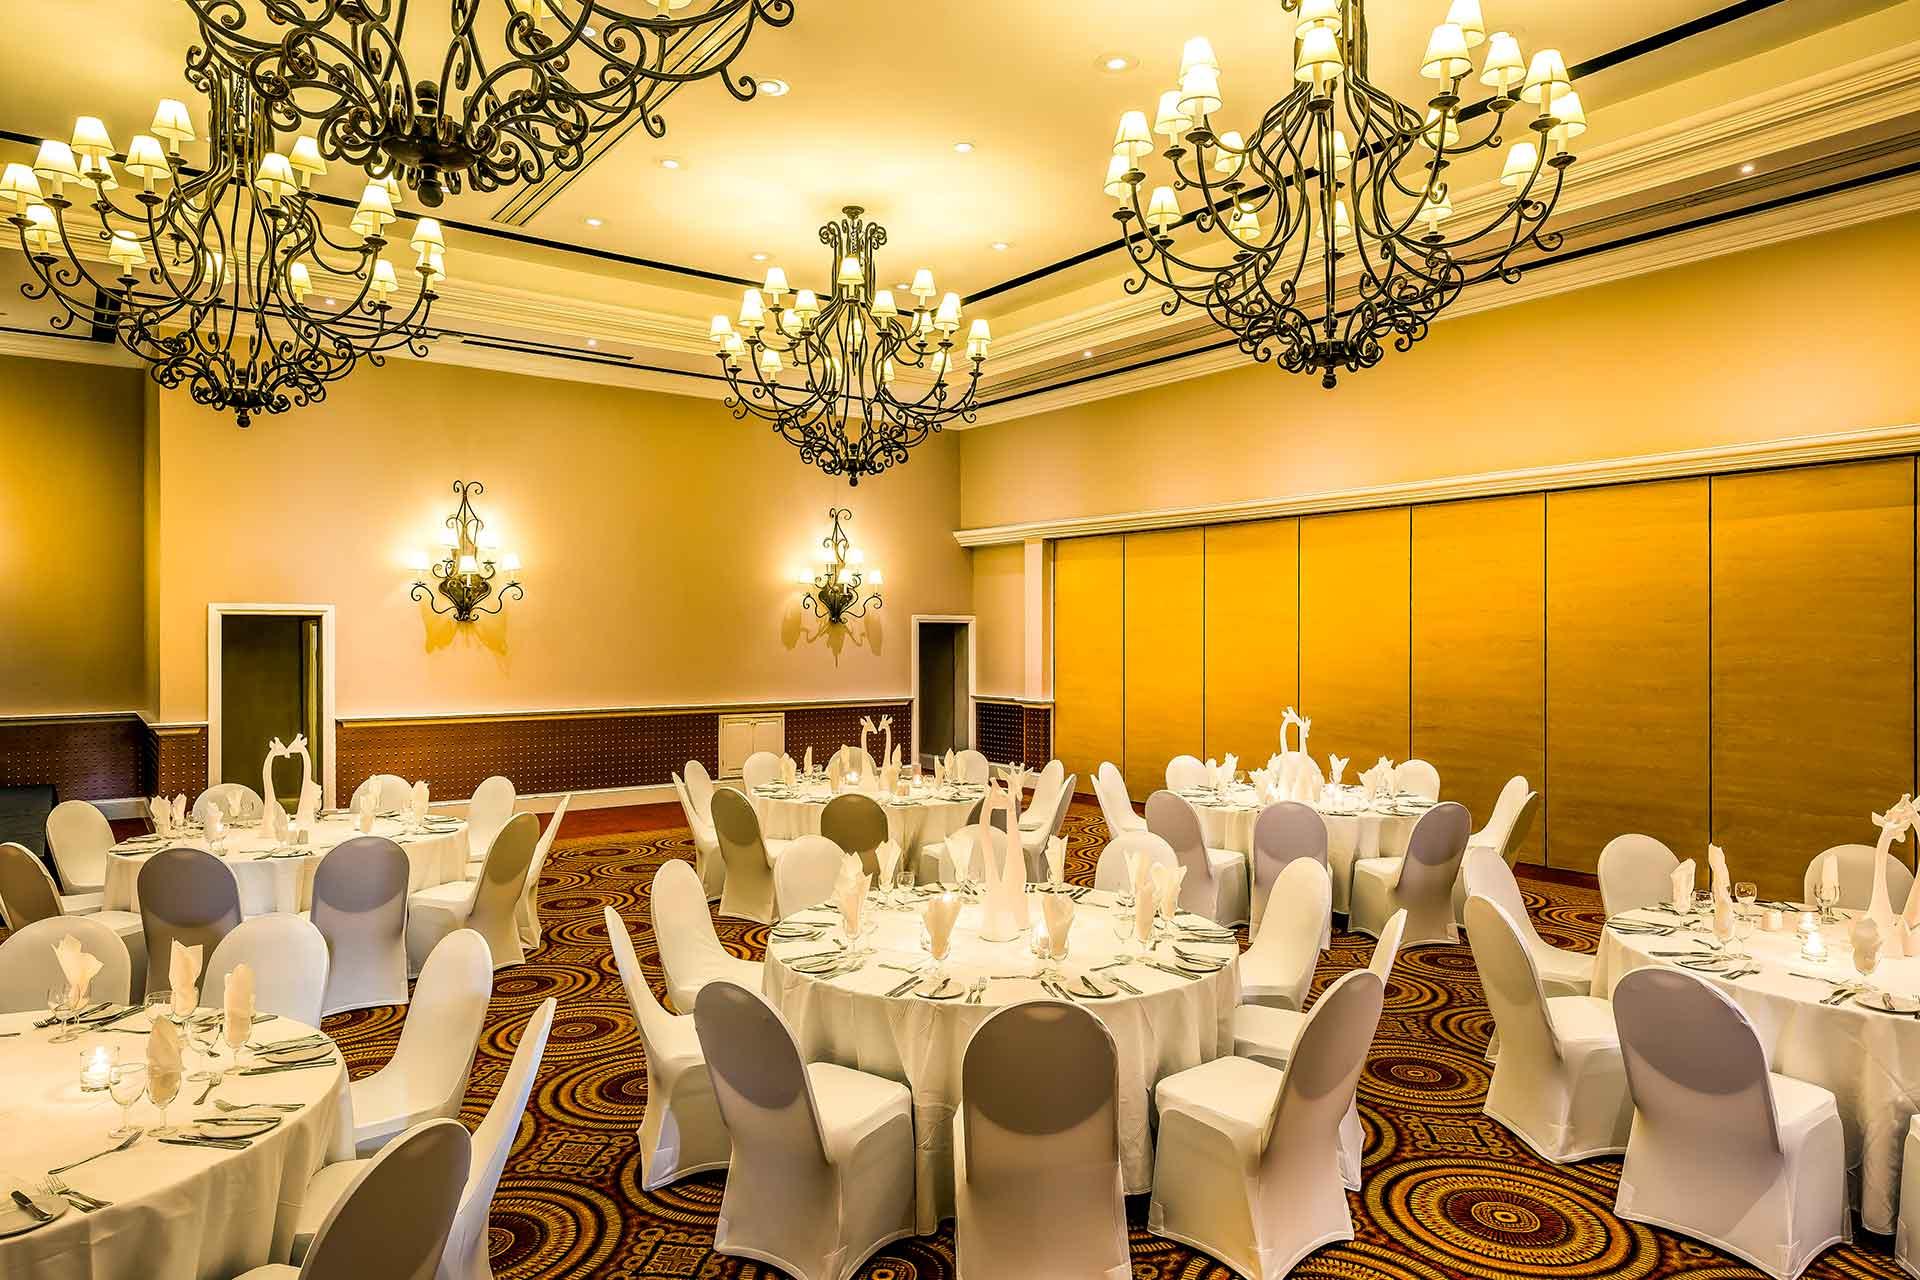 Celebrate weddings in Zambia in style at AVANI Victoria Falls